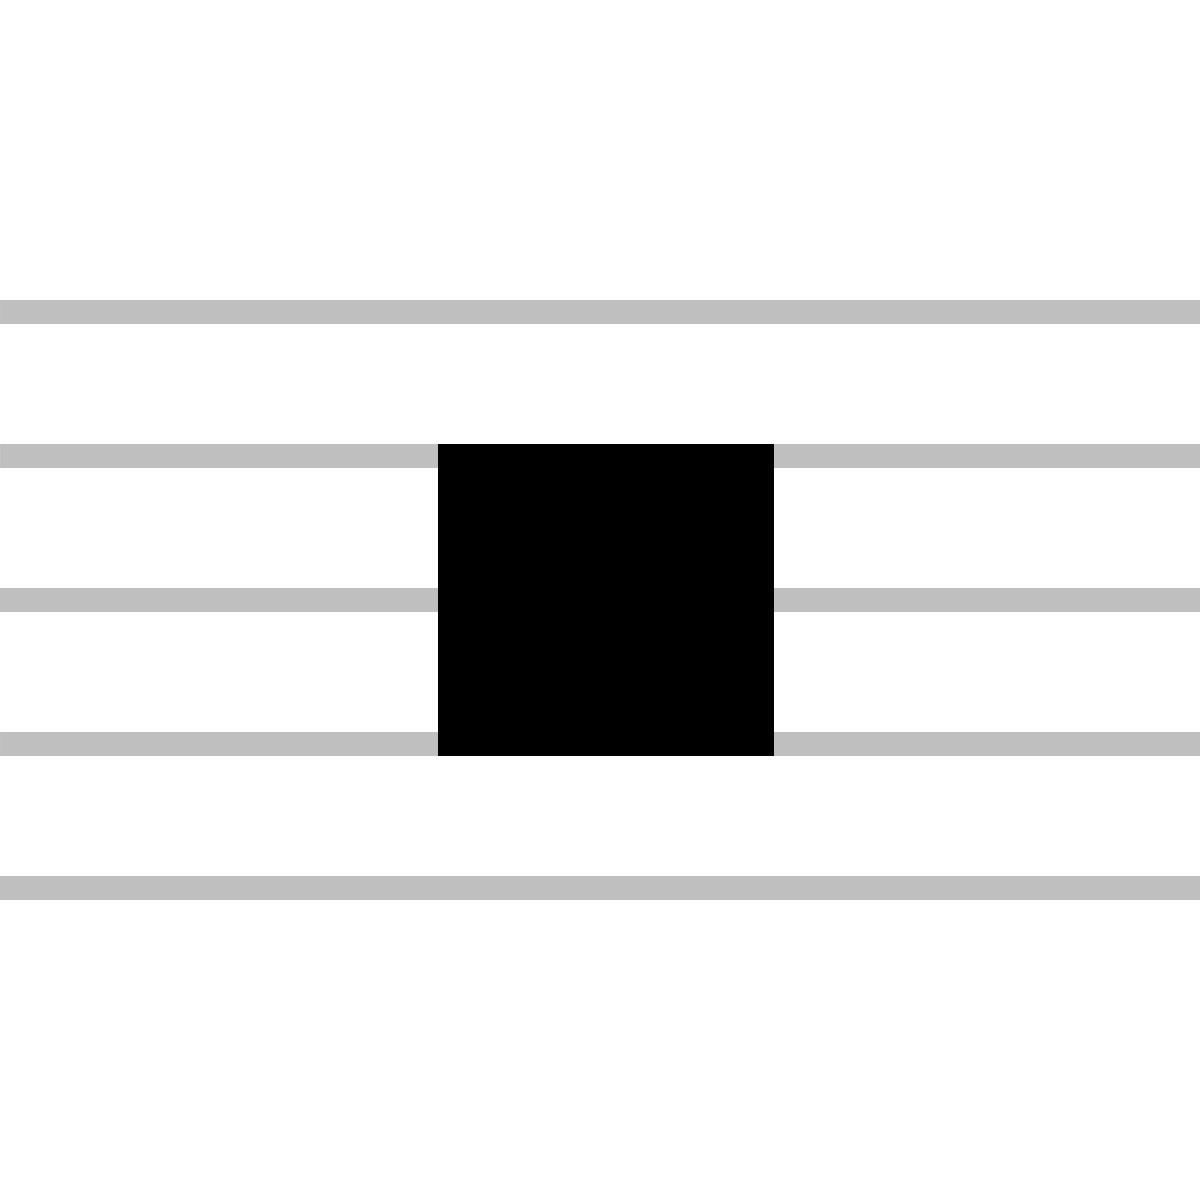 f:id:nu-composers:20191017222647j:plain